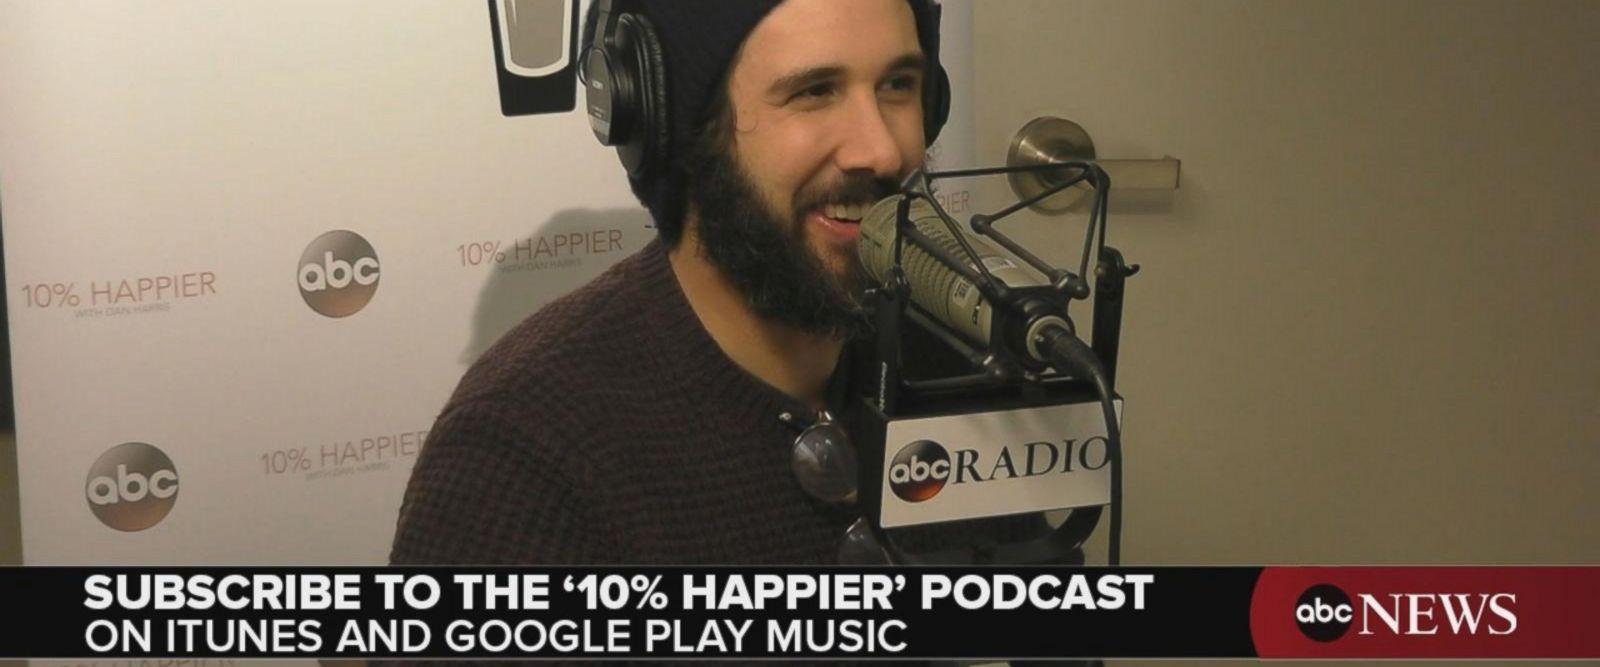 VIDEO: '10% Happier' with Josh Groban